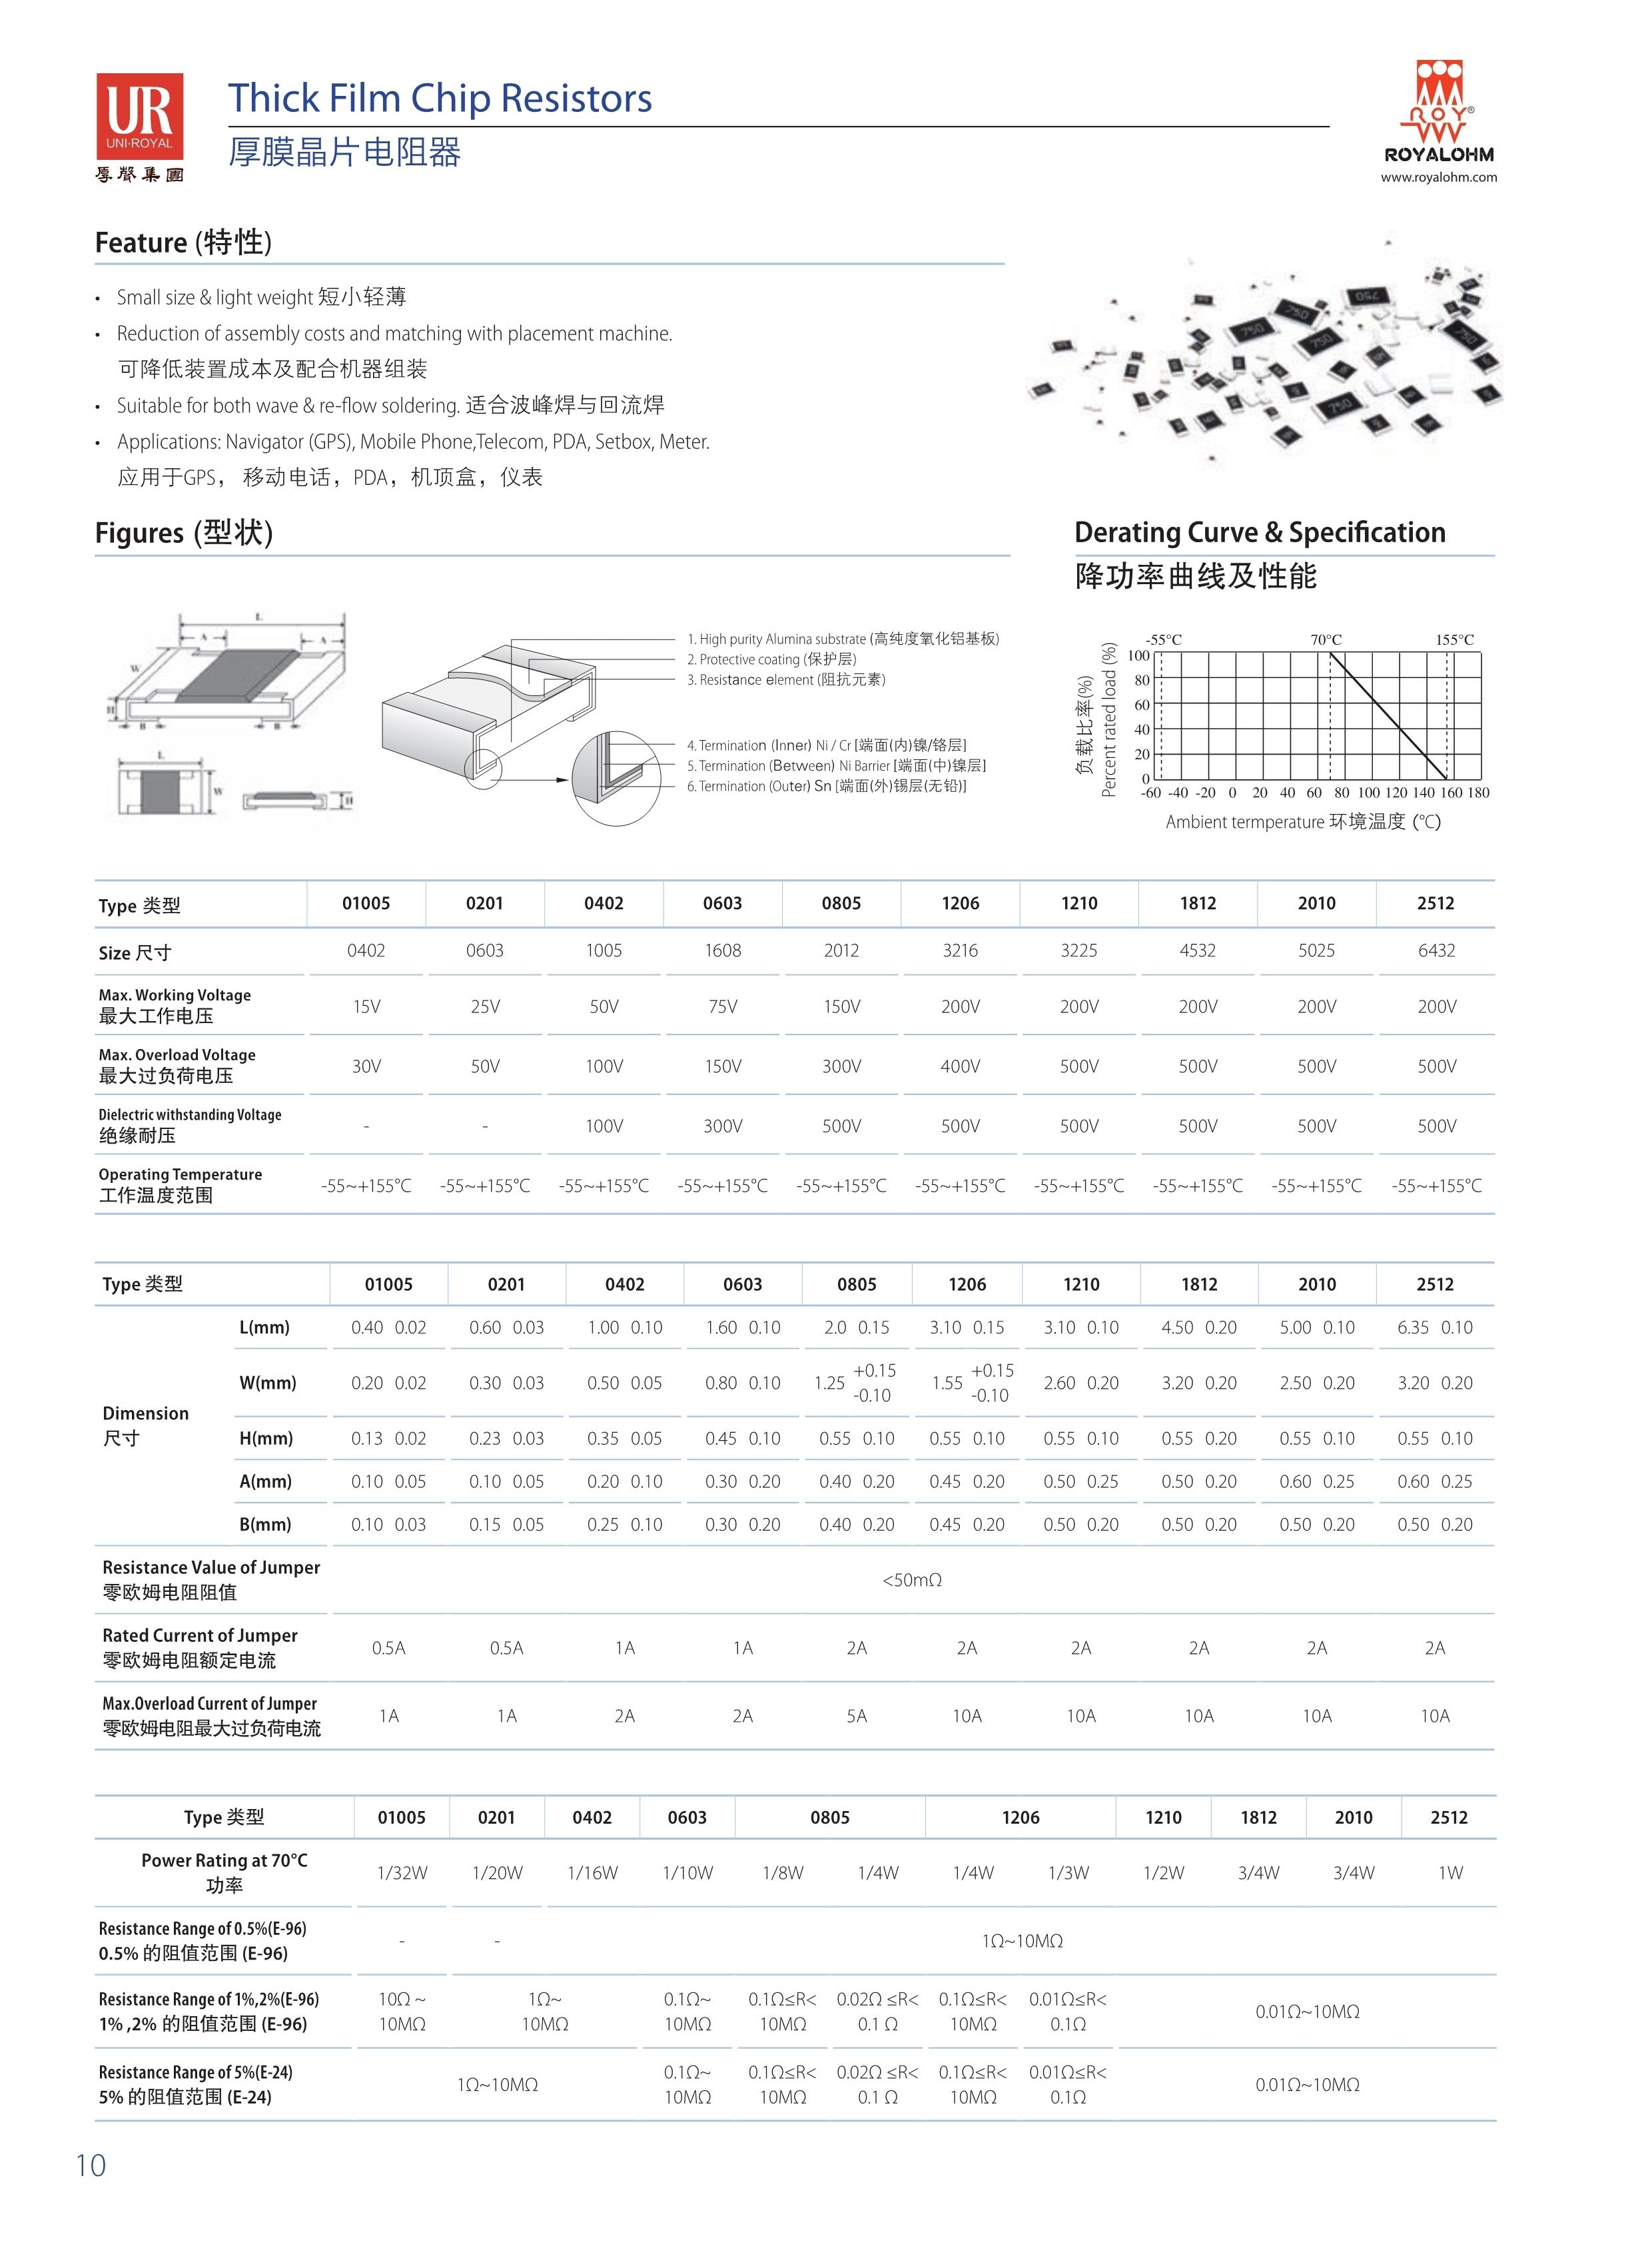 070121262829_0uni-royal厚聲貼片電阻中文版全系列規格書_10